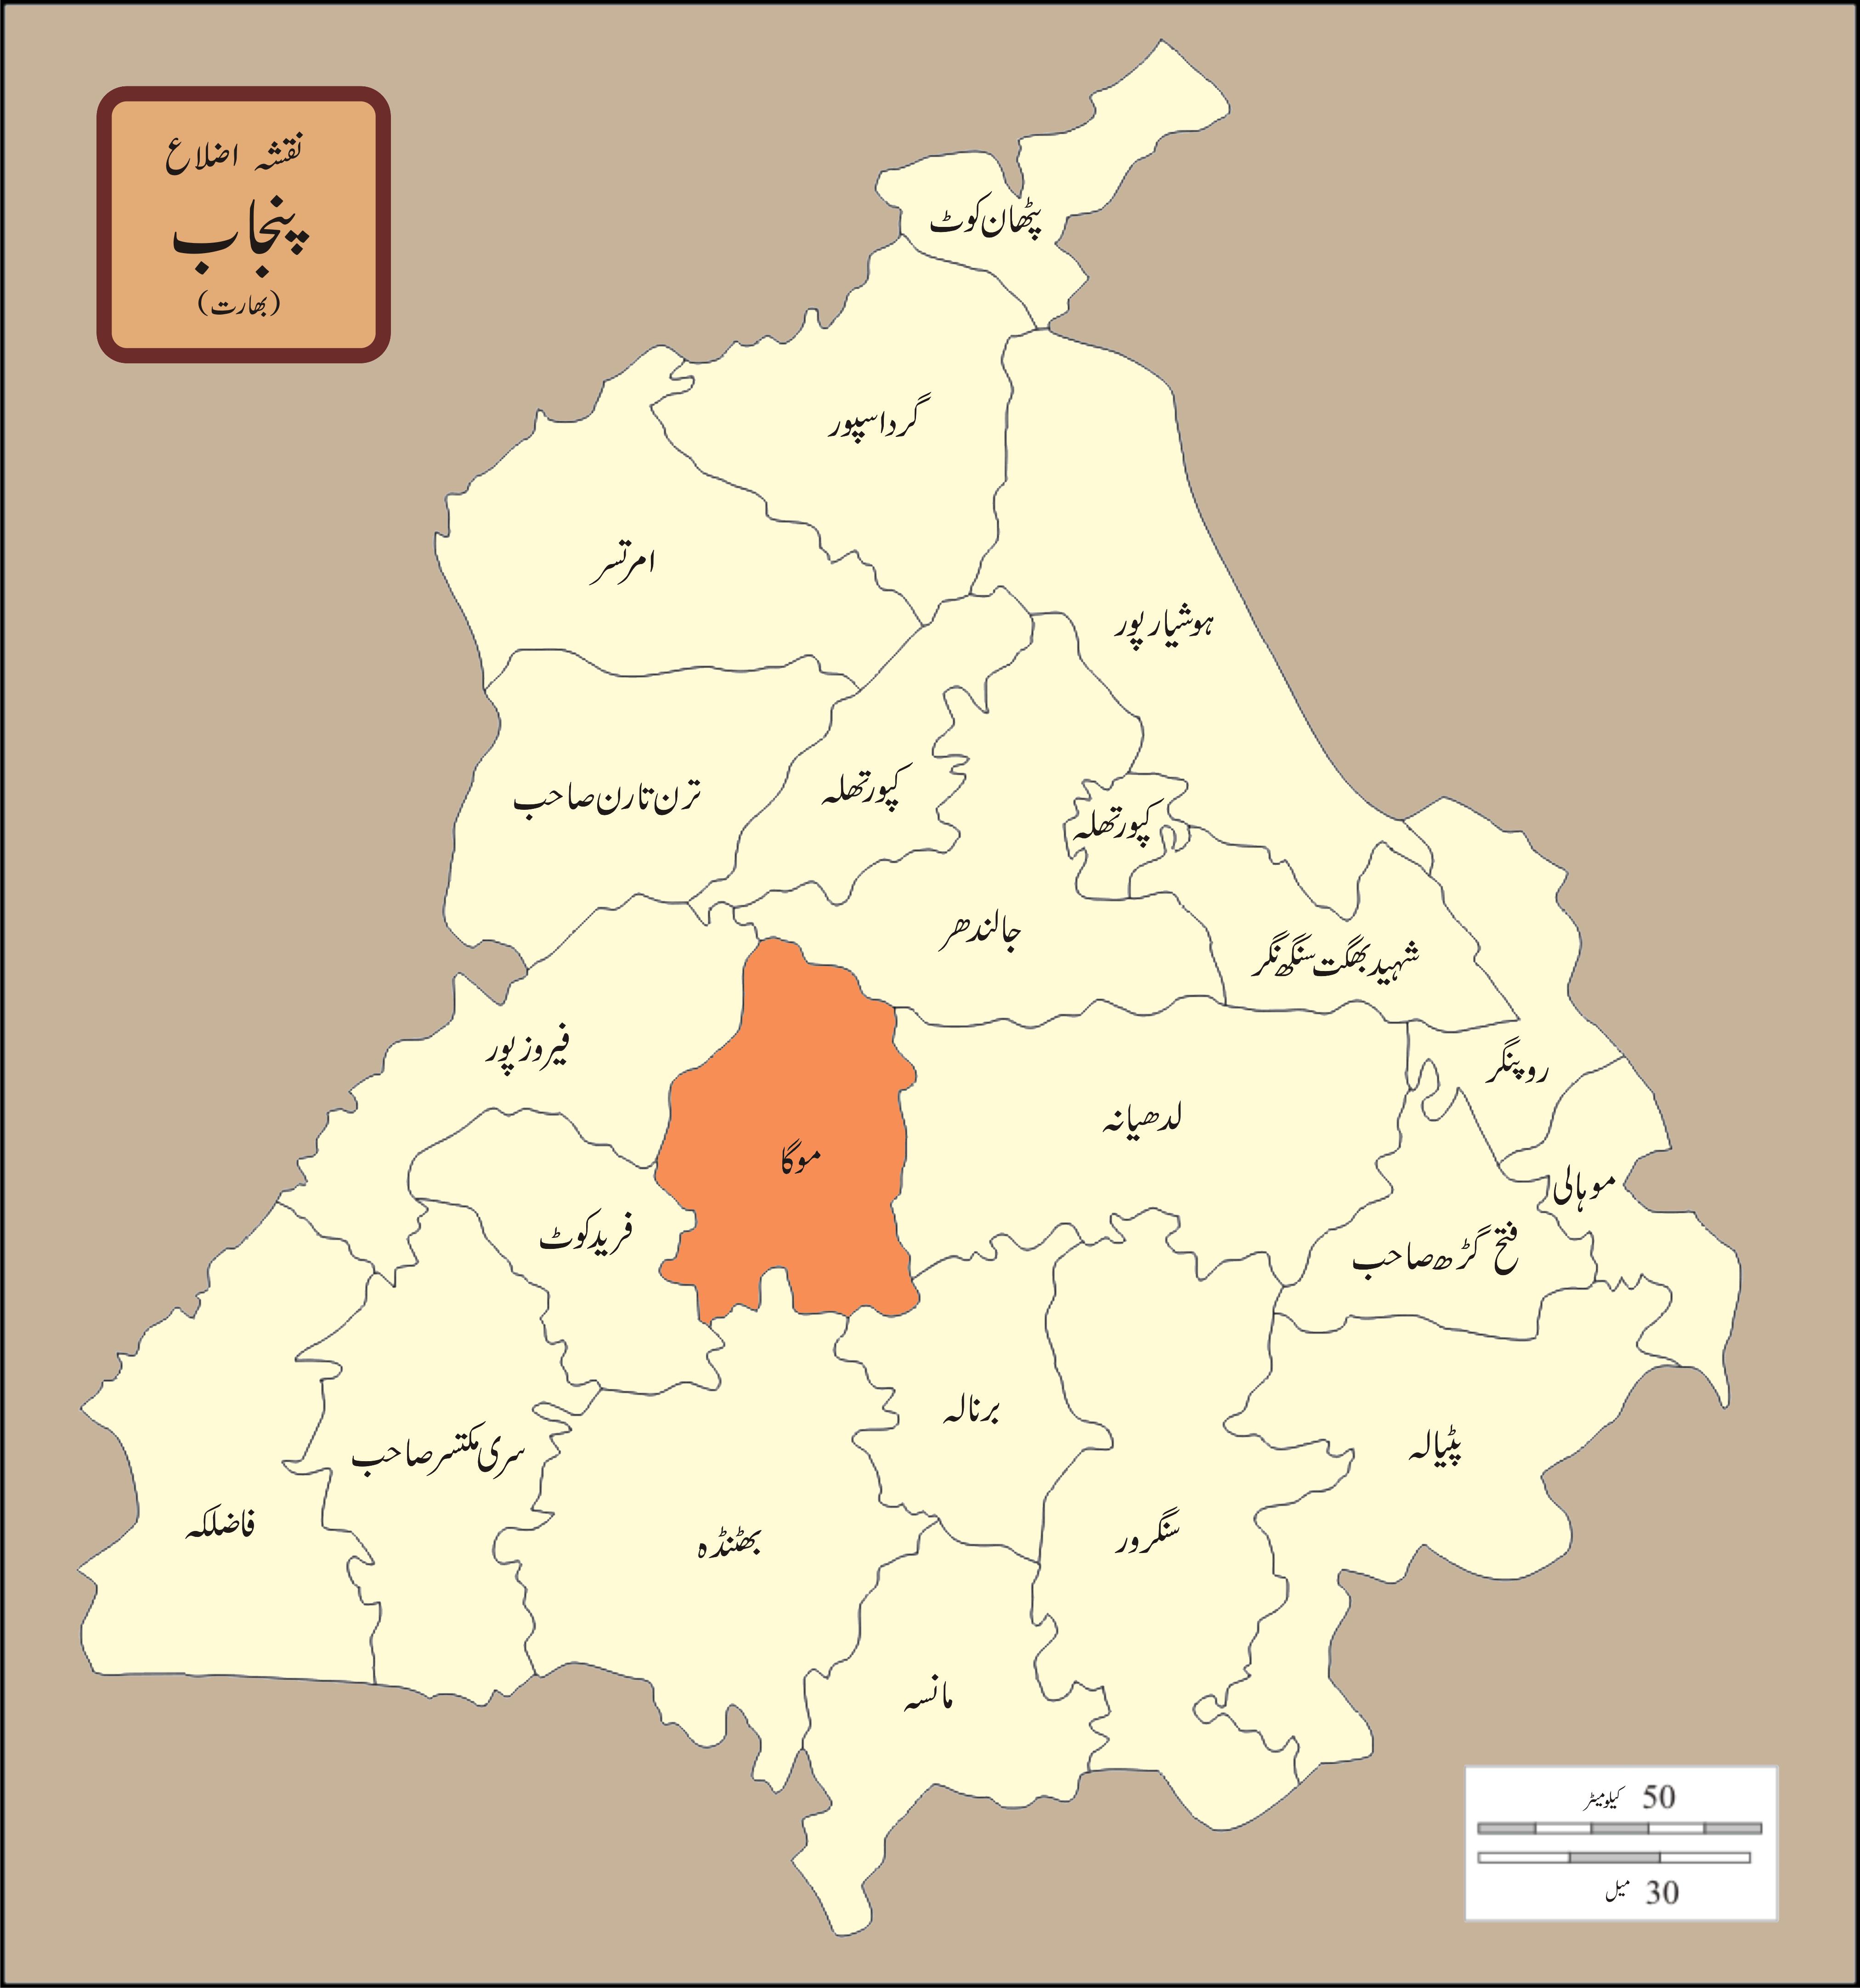 Hindustani language